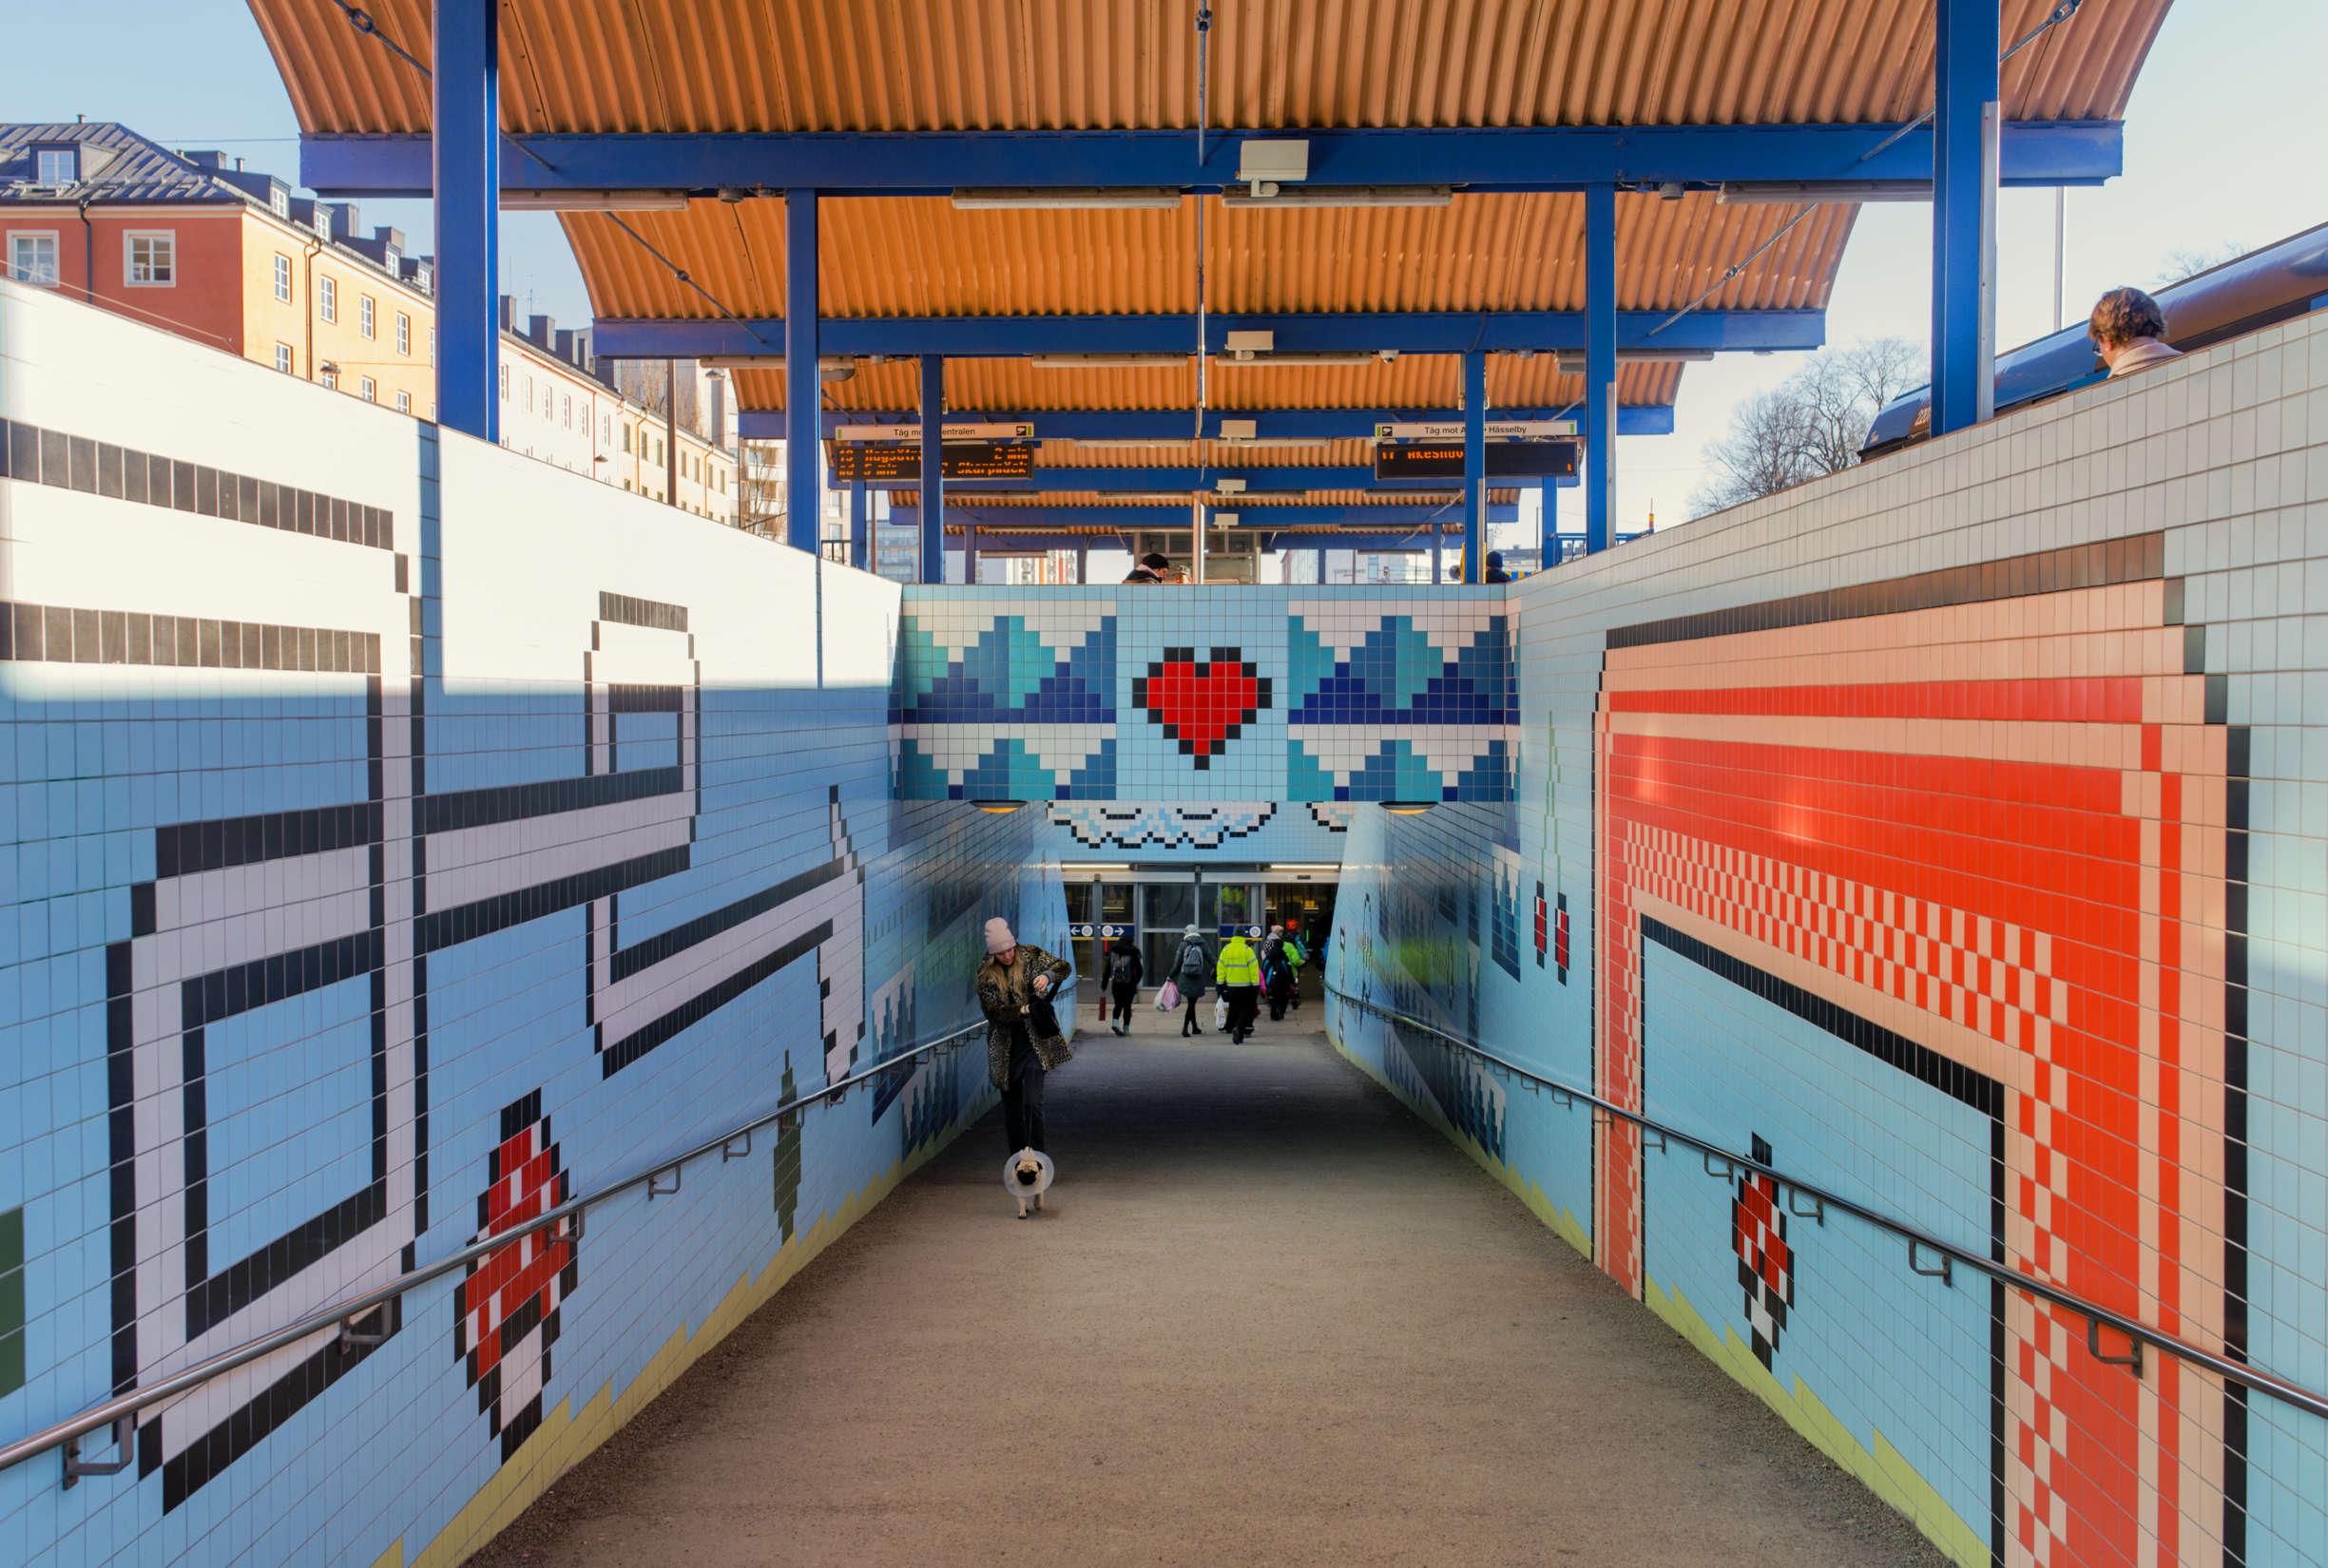 Stockholm Subway Art: 8 Challenges HR Face When Bringing New Hires to Sweden